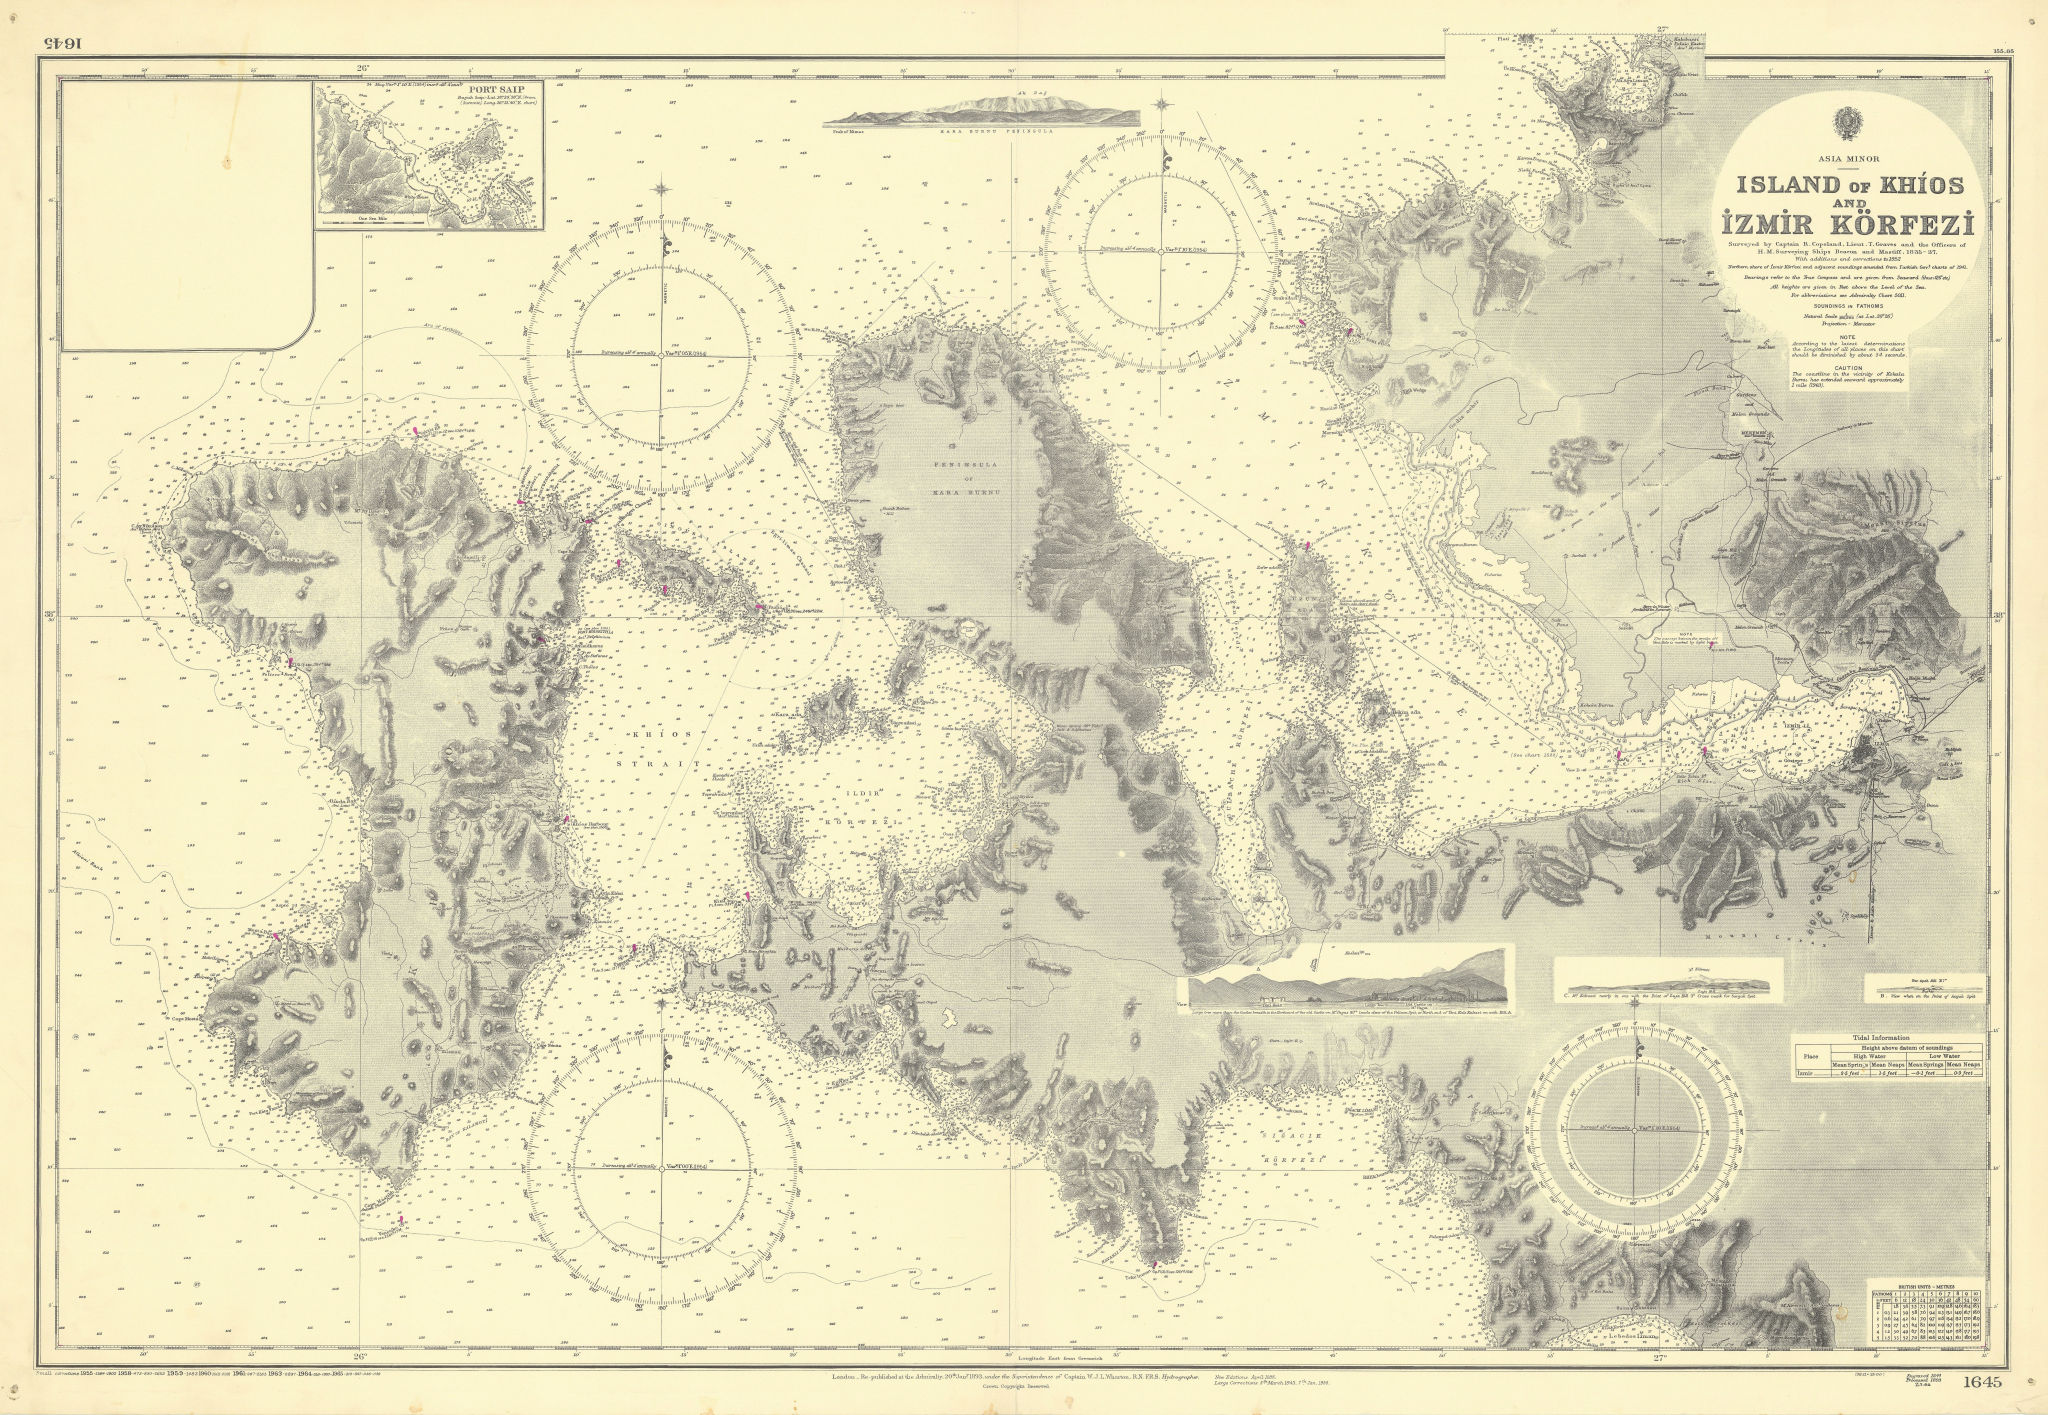 Chios Karaburun Peninsula Turkey Greece Aegean ADMIRALTY chart 1893 (1965) map